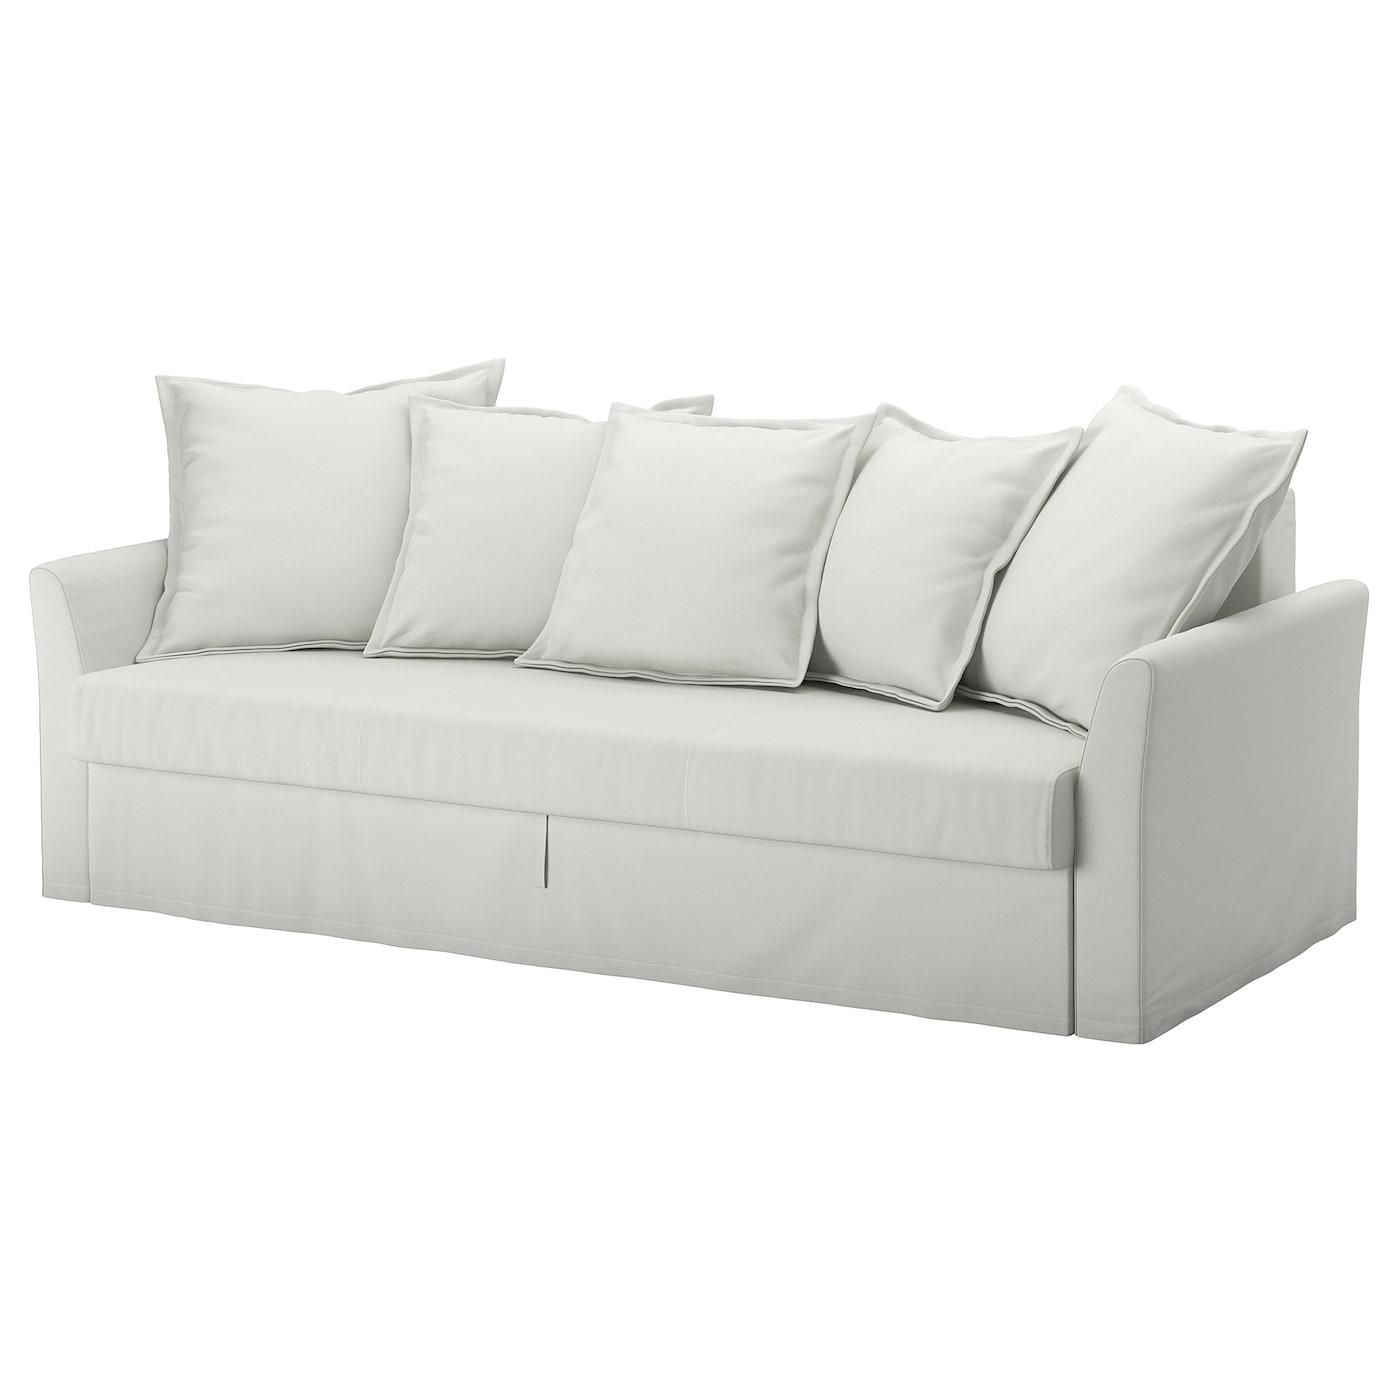 - HOLMSUND Sleeper Sofa, Orrsta Light White-gray - IKEA